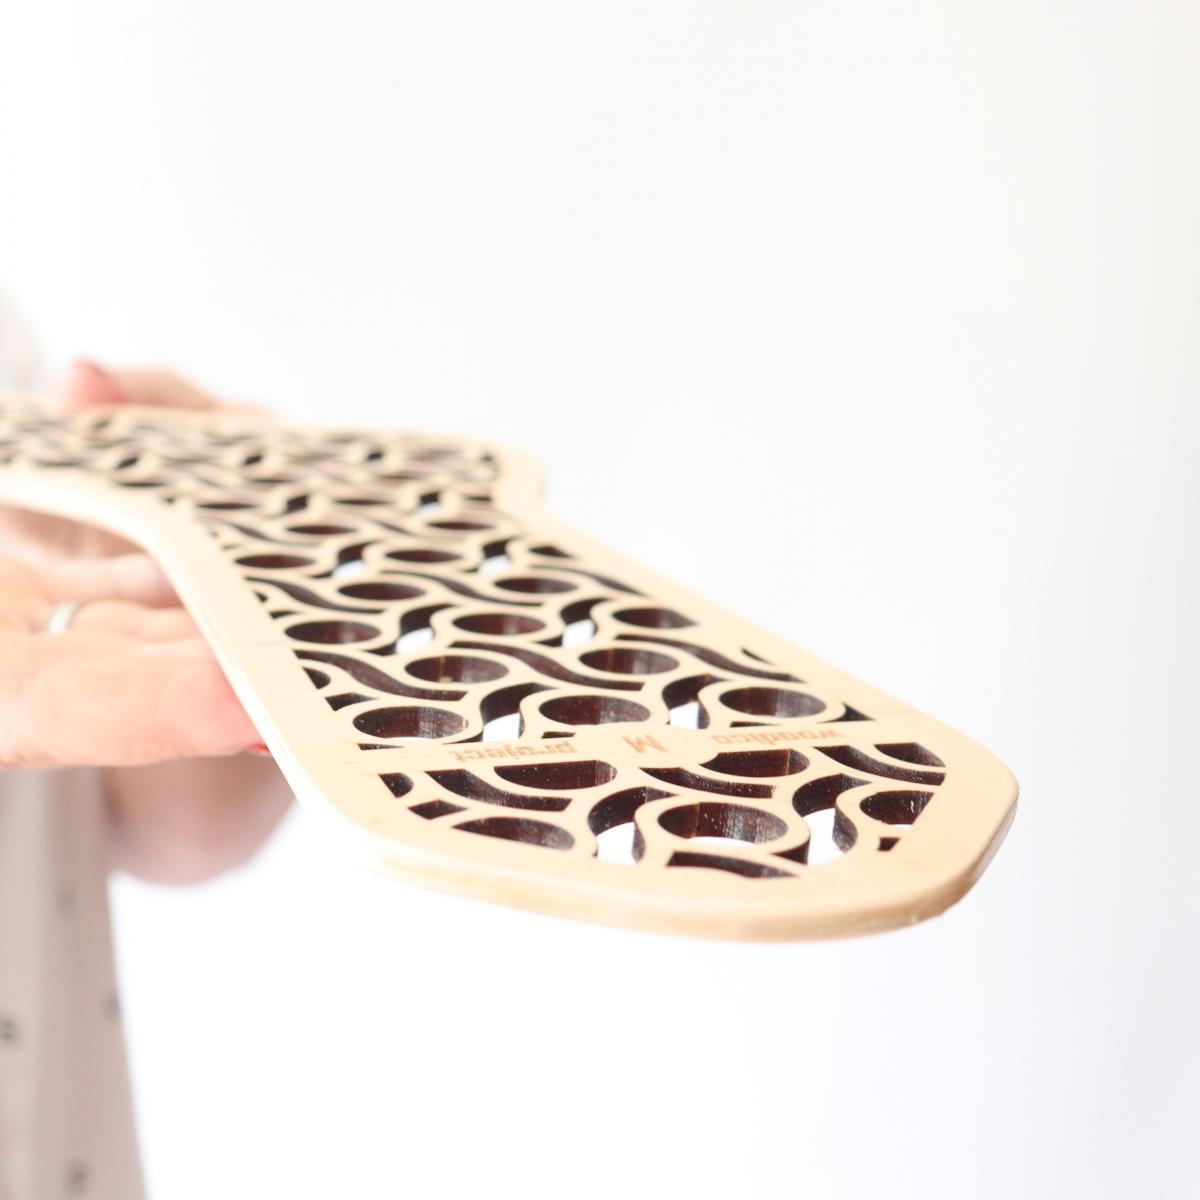 woodico.pro wooden sock blockers pasta 8 1200x1200 - Wooden sock blockers / Pasta